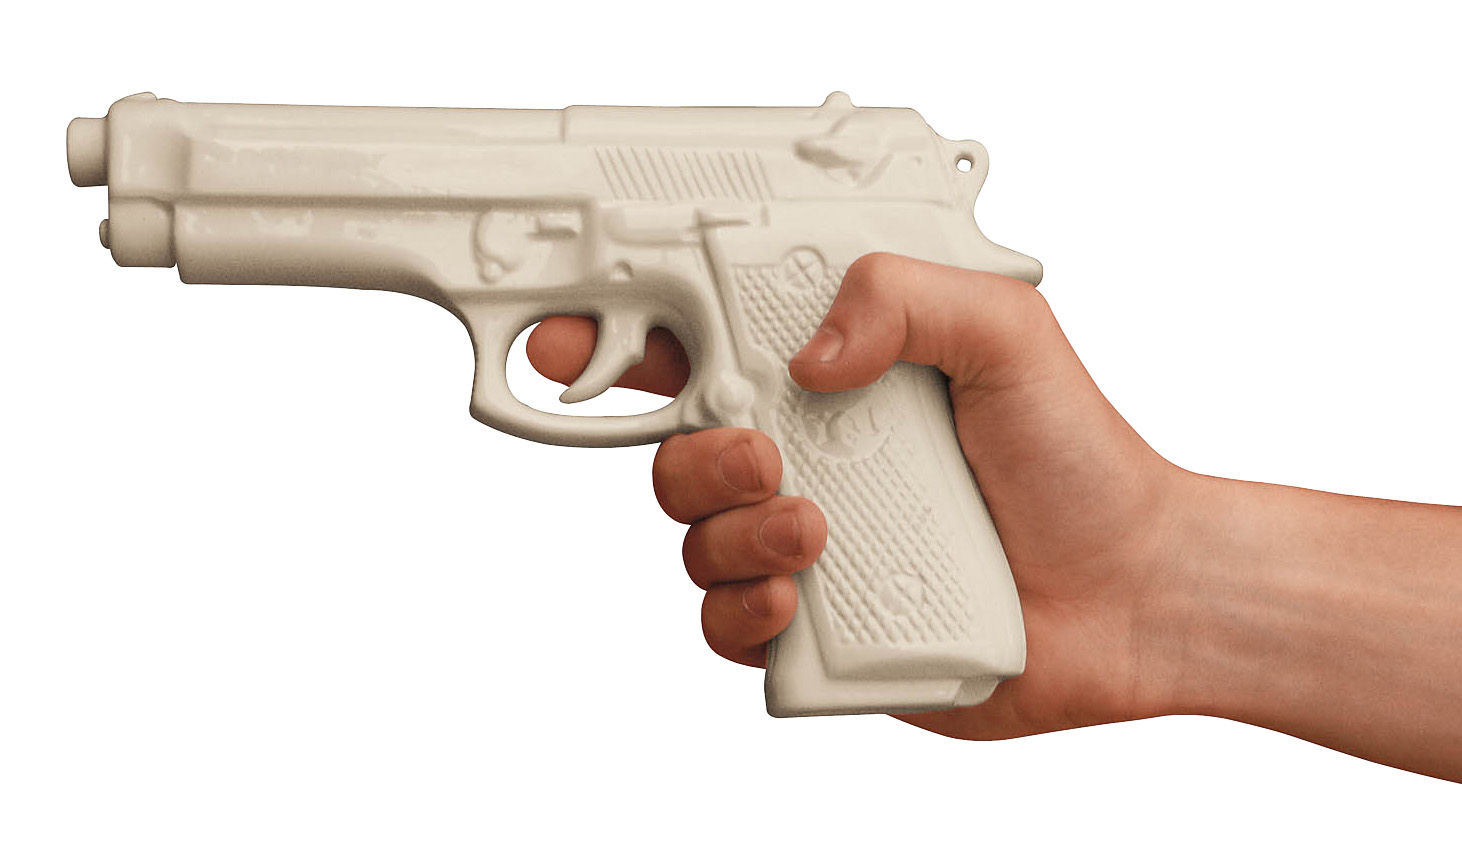 Dekoration - Dekorationsartikel - Memorabilia My Gun Dekoration Pistole aus Porzellan - Seletti - Weiß - Pistole - Porzellan